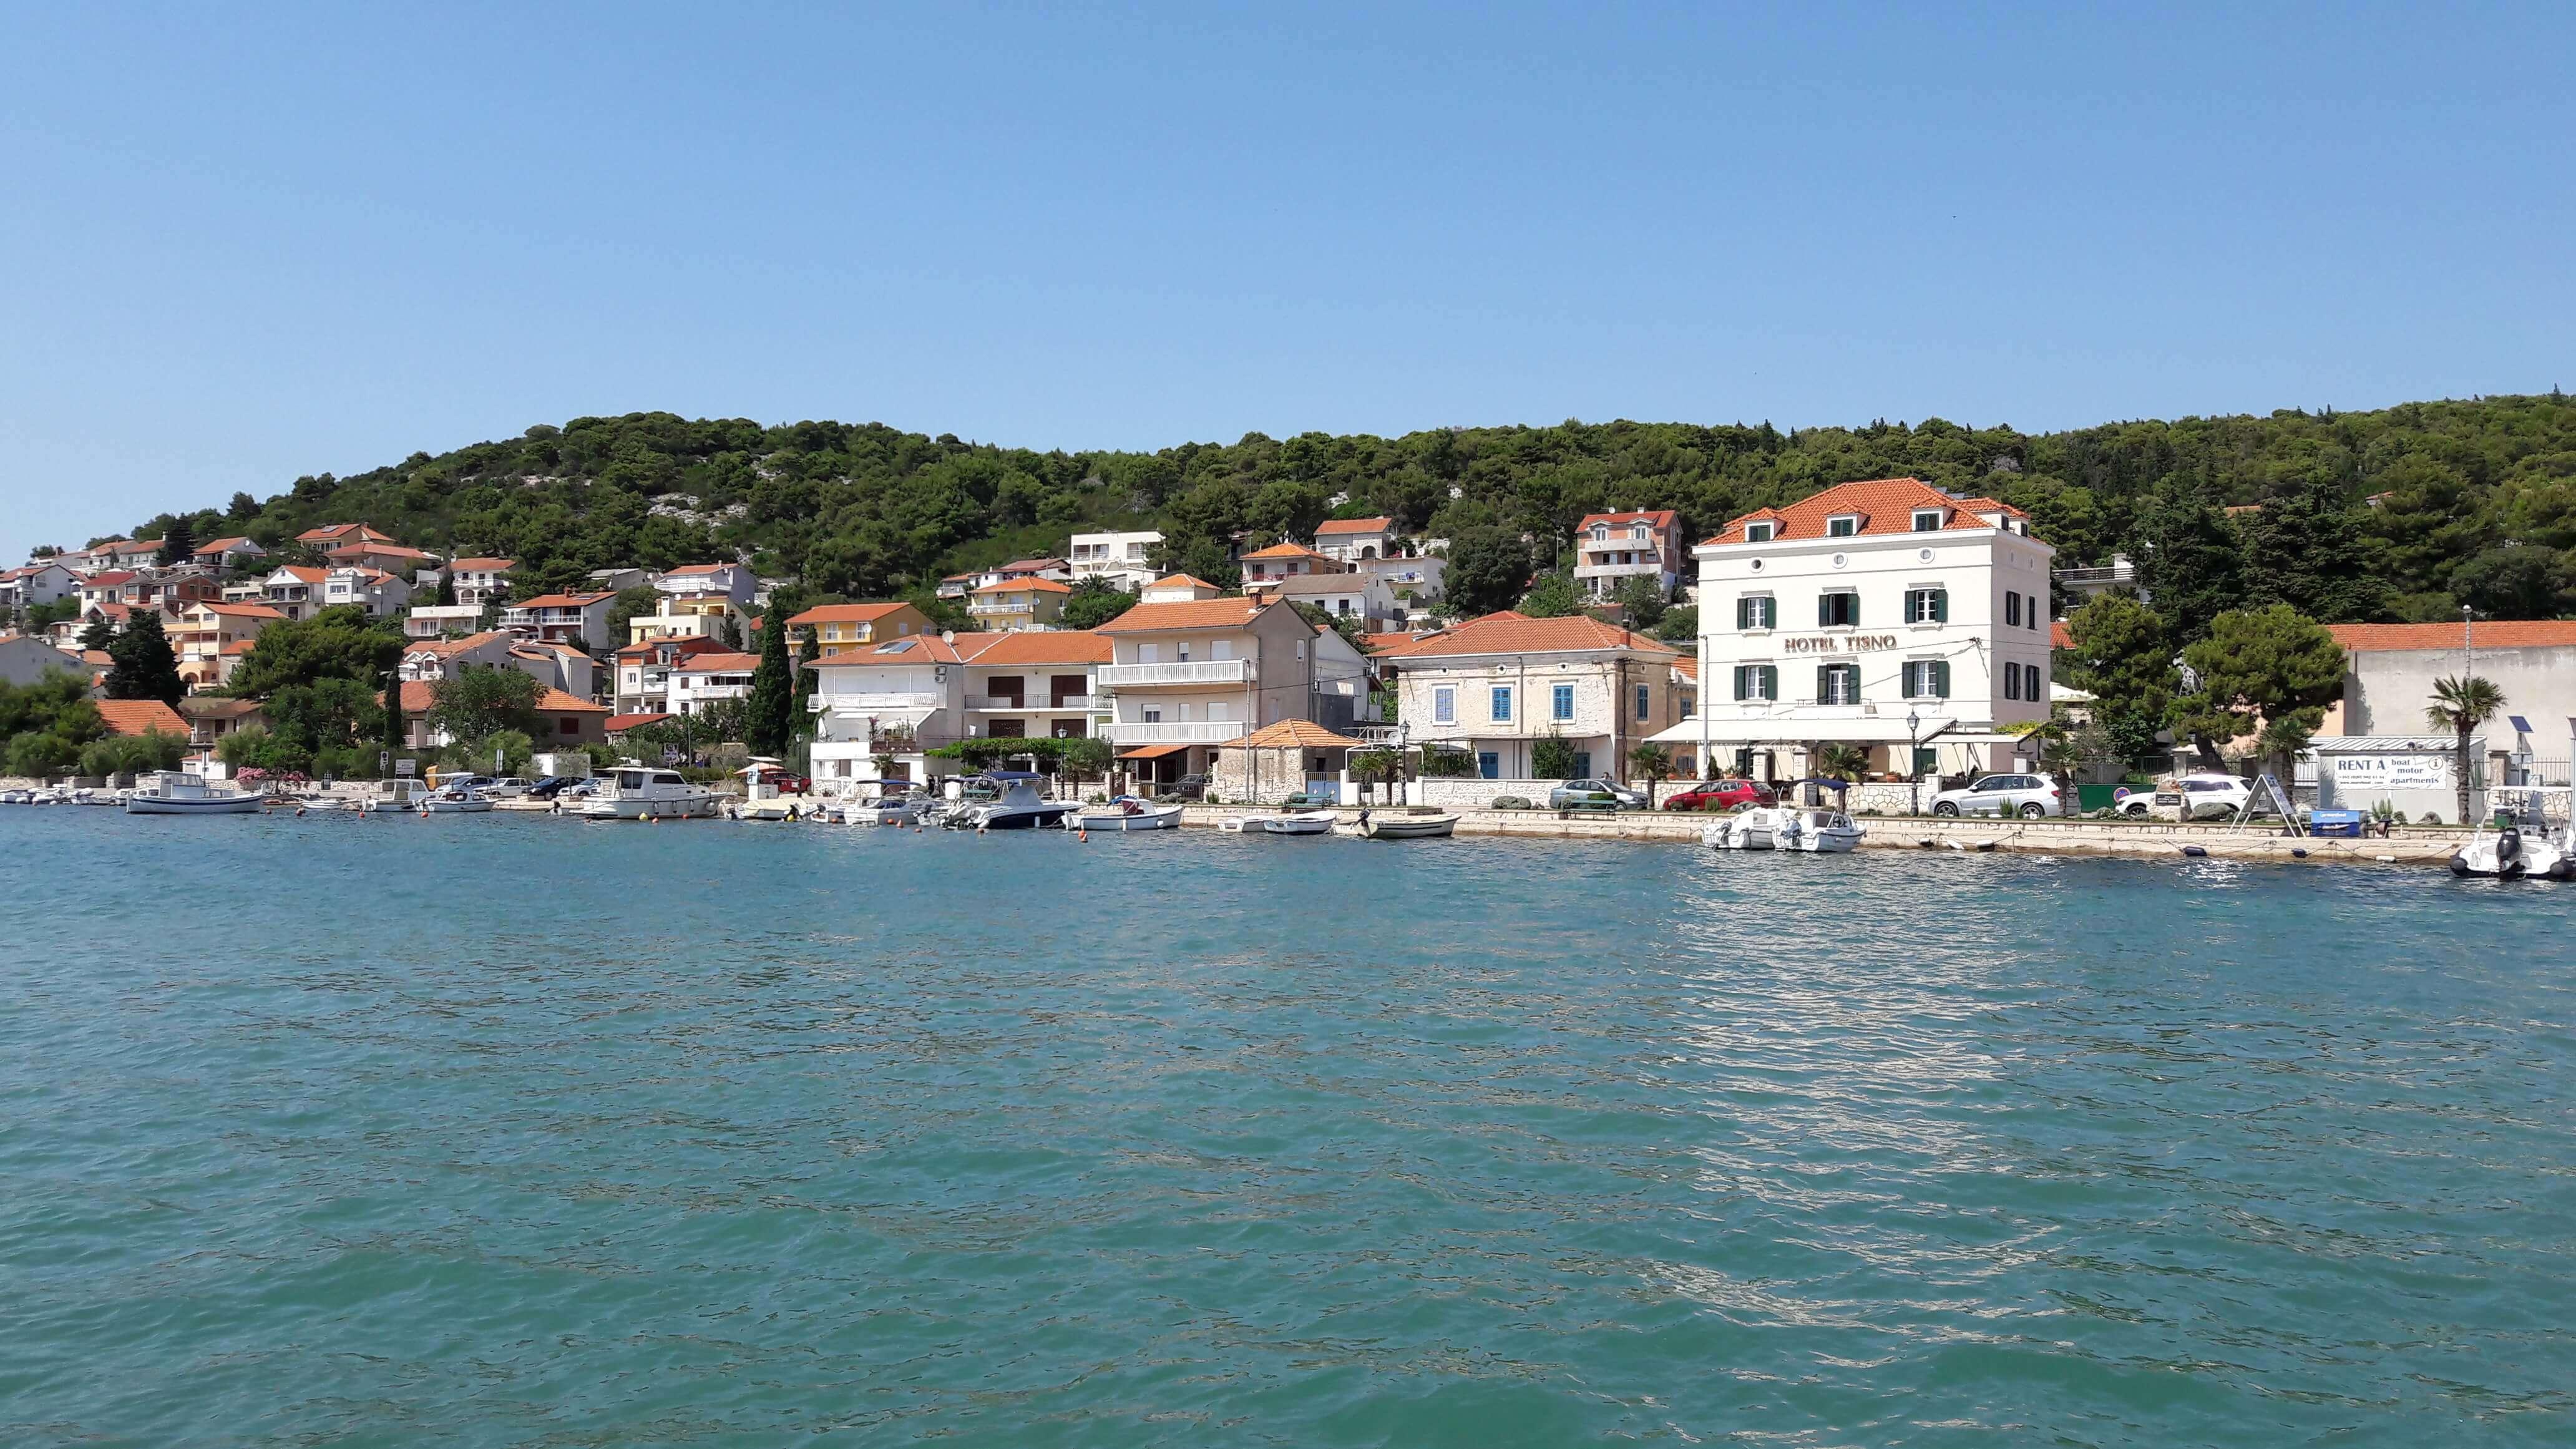 Bootsführerschein-Kurs-Kroatien